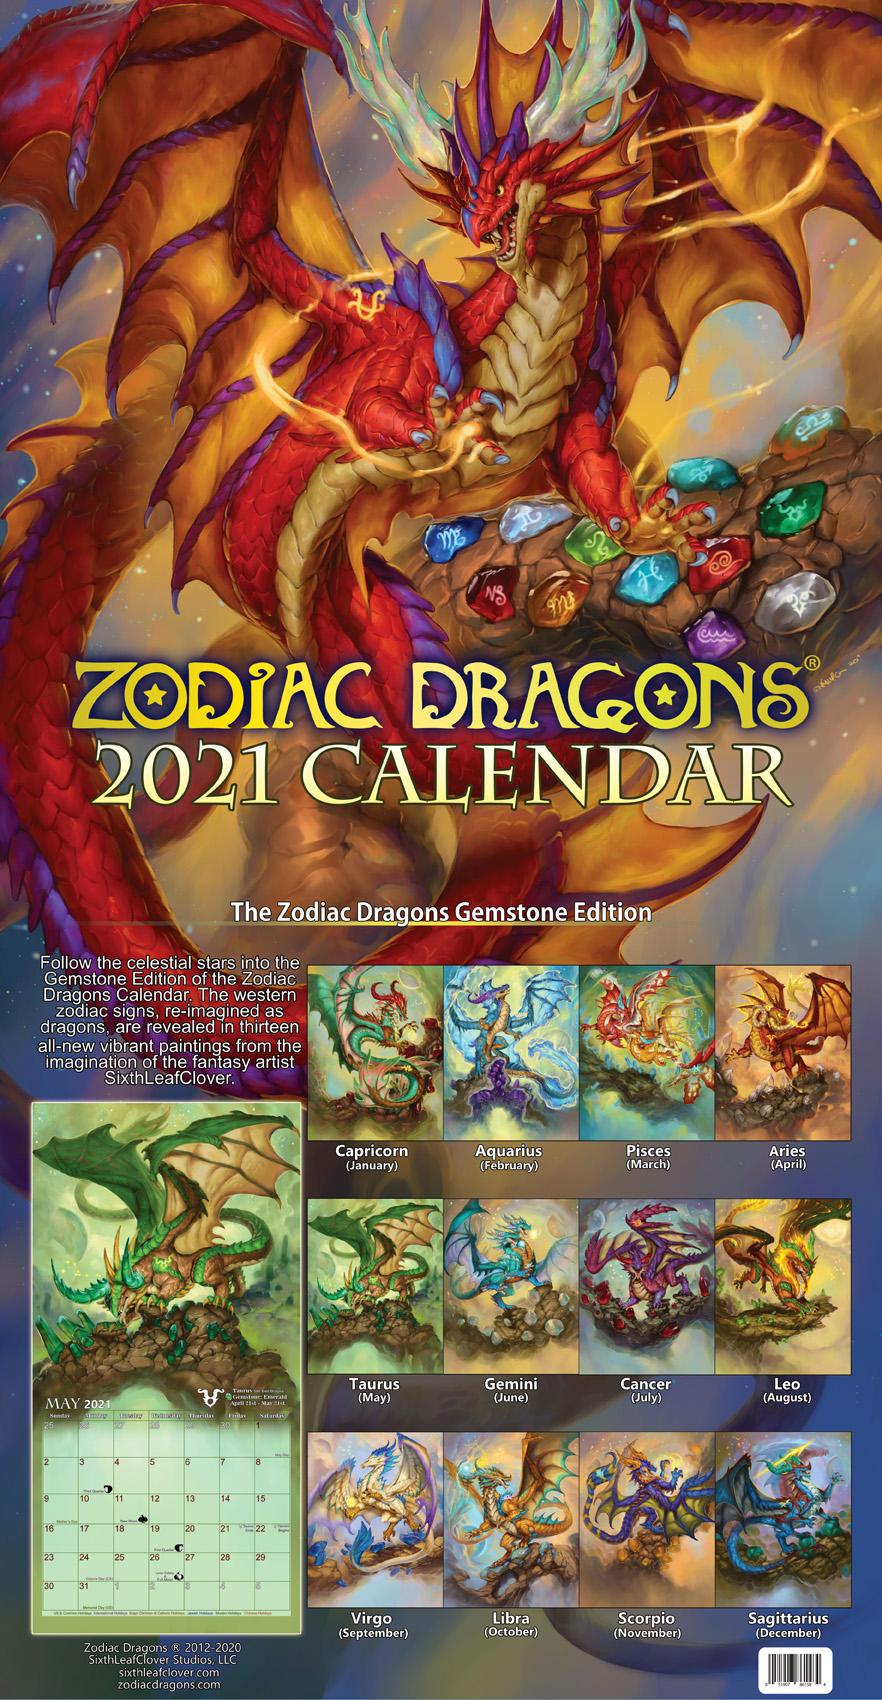 Dragon Calendar 2021 2021 Zodiac Dragons Calendar by The SixthLeafClover on DeviantArt